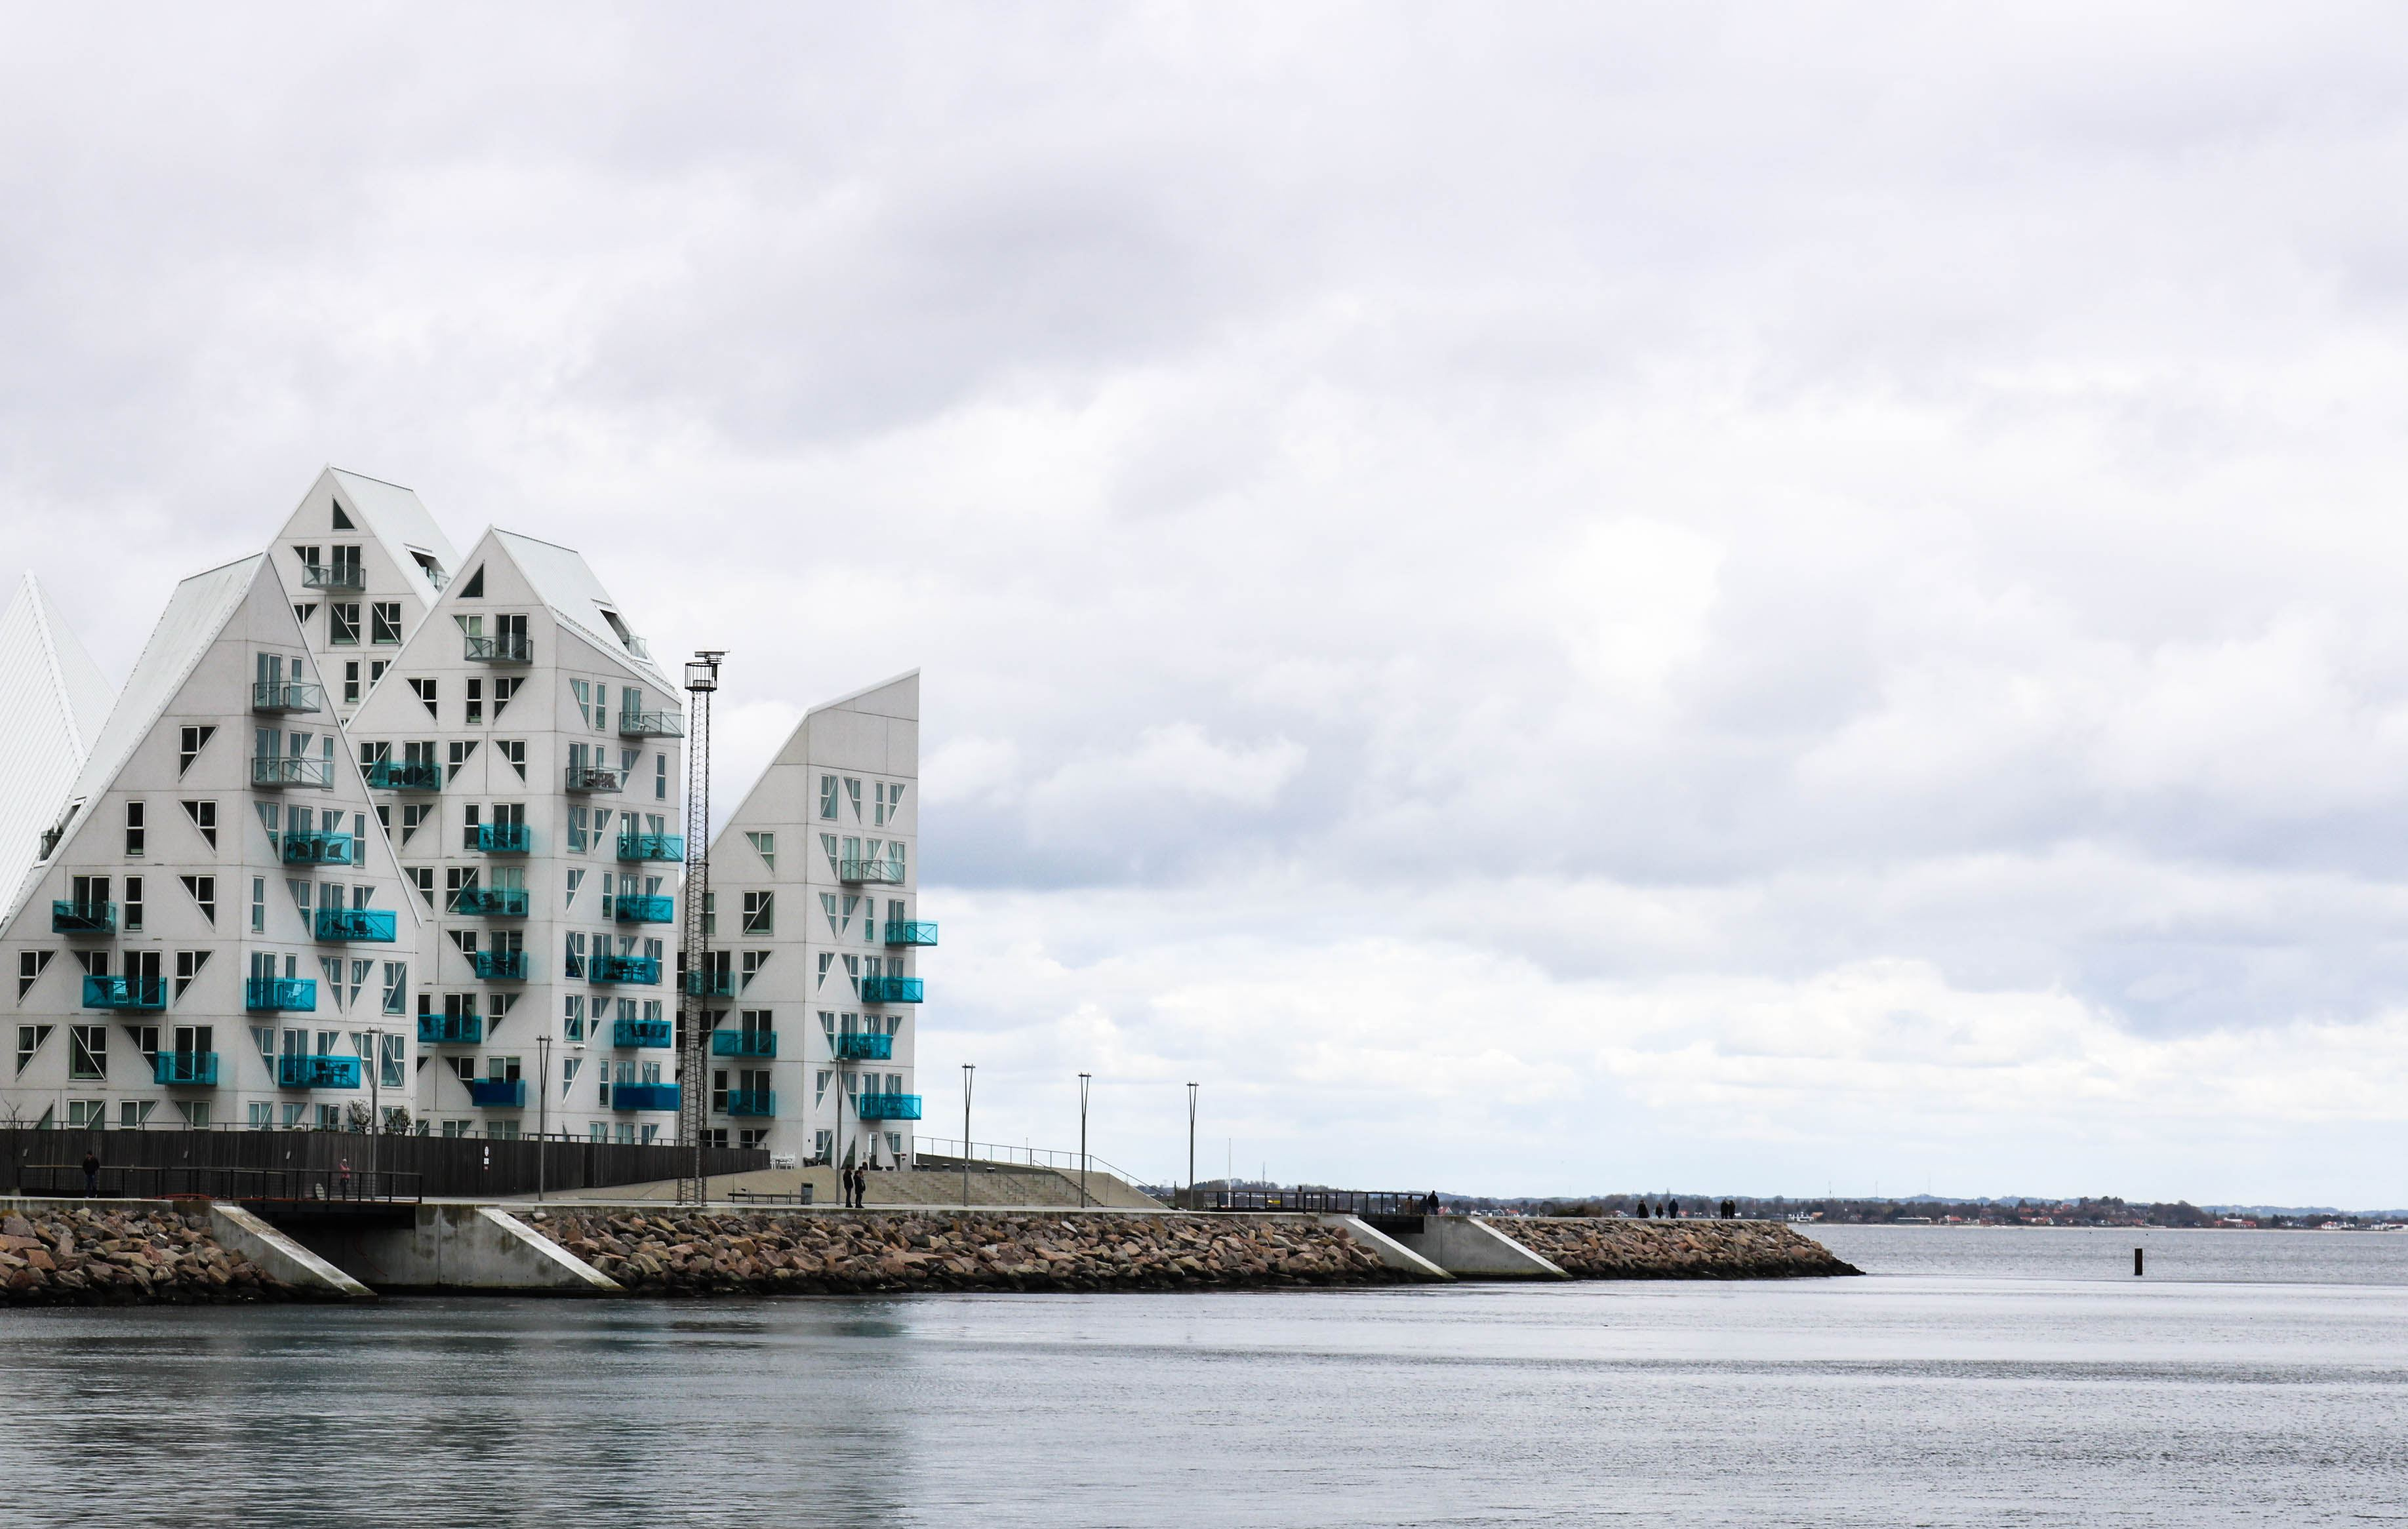 Iceberg 4 560x420 - Why You Should Visit Aarhus Before 2018